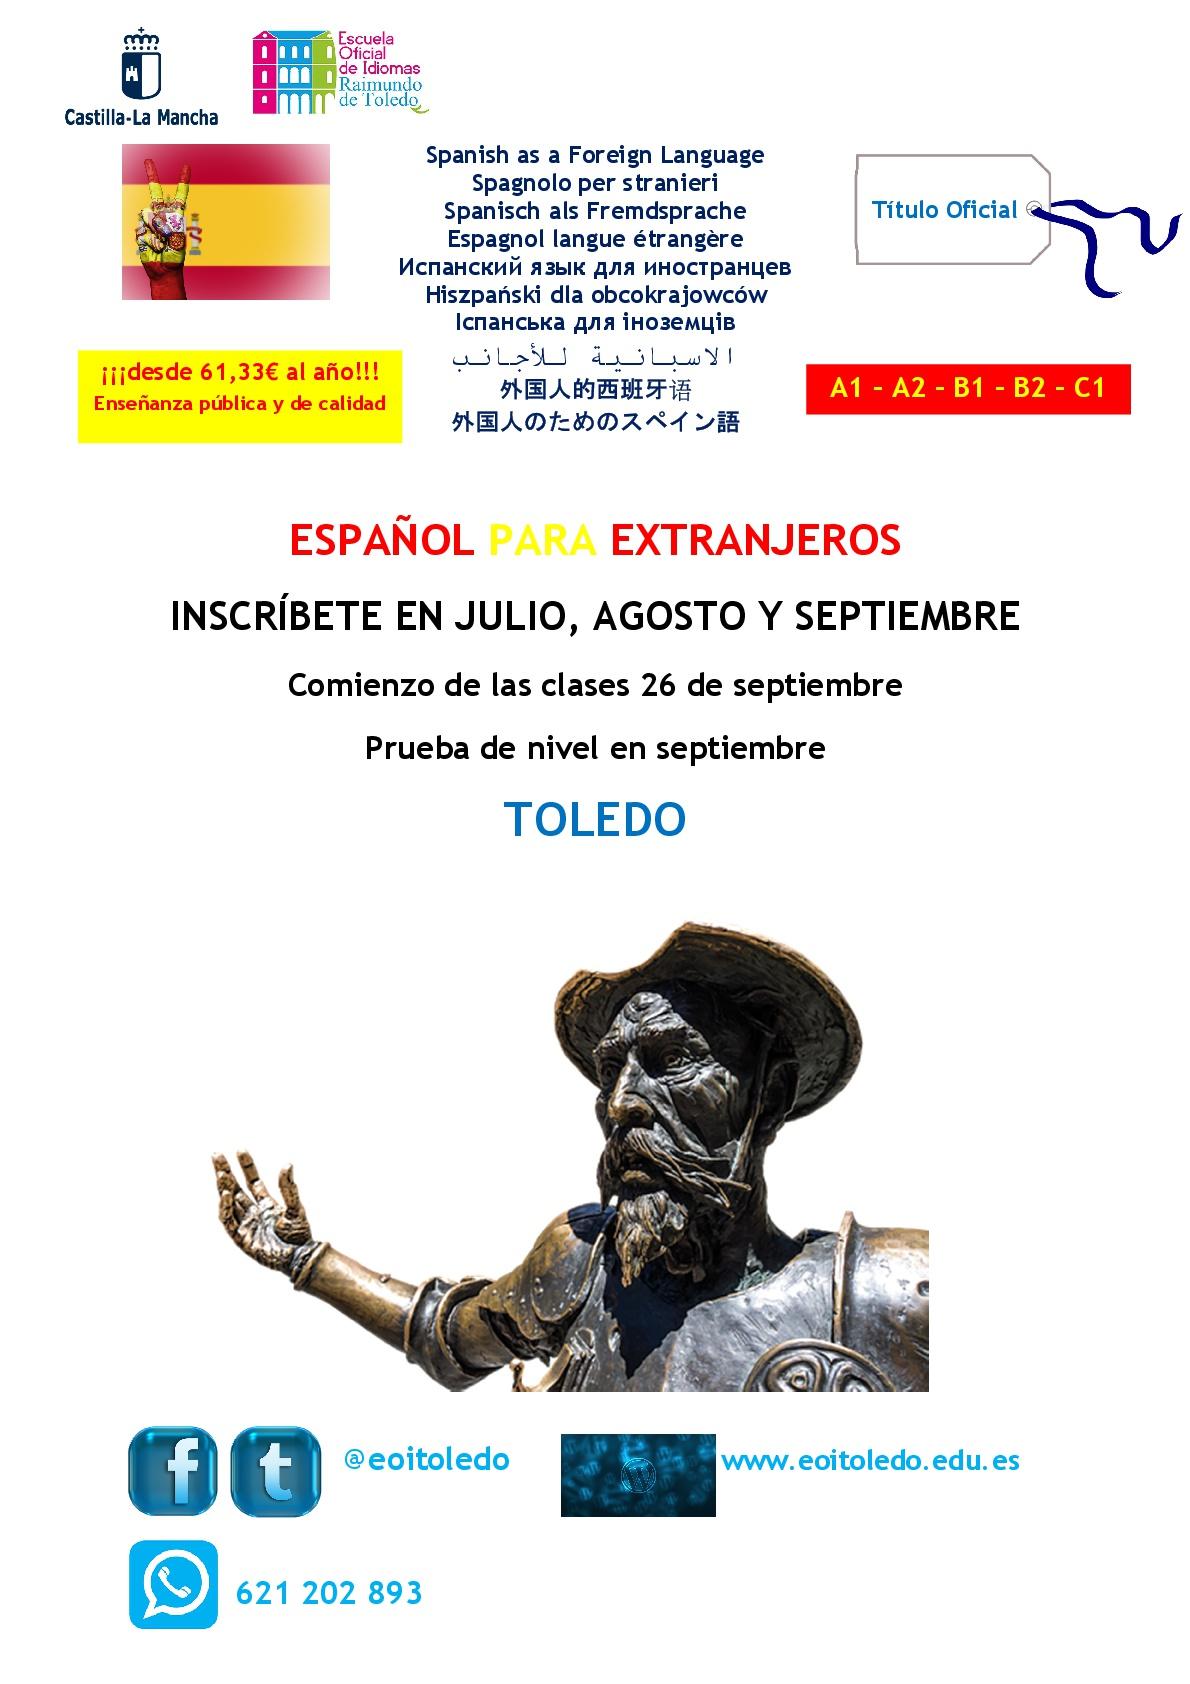 Spanish as a Foreign Language 001 - Aprende Español en nuestra EOI - comienzo 26 de septiembre